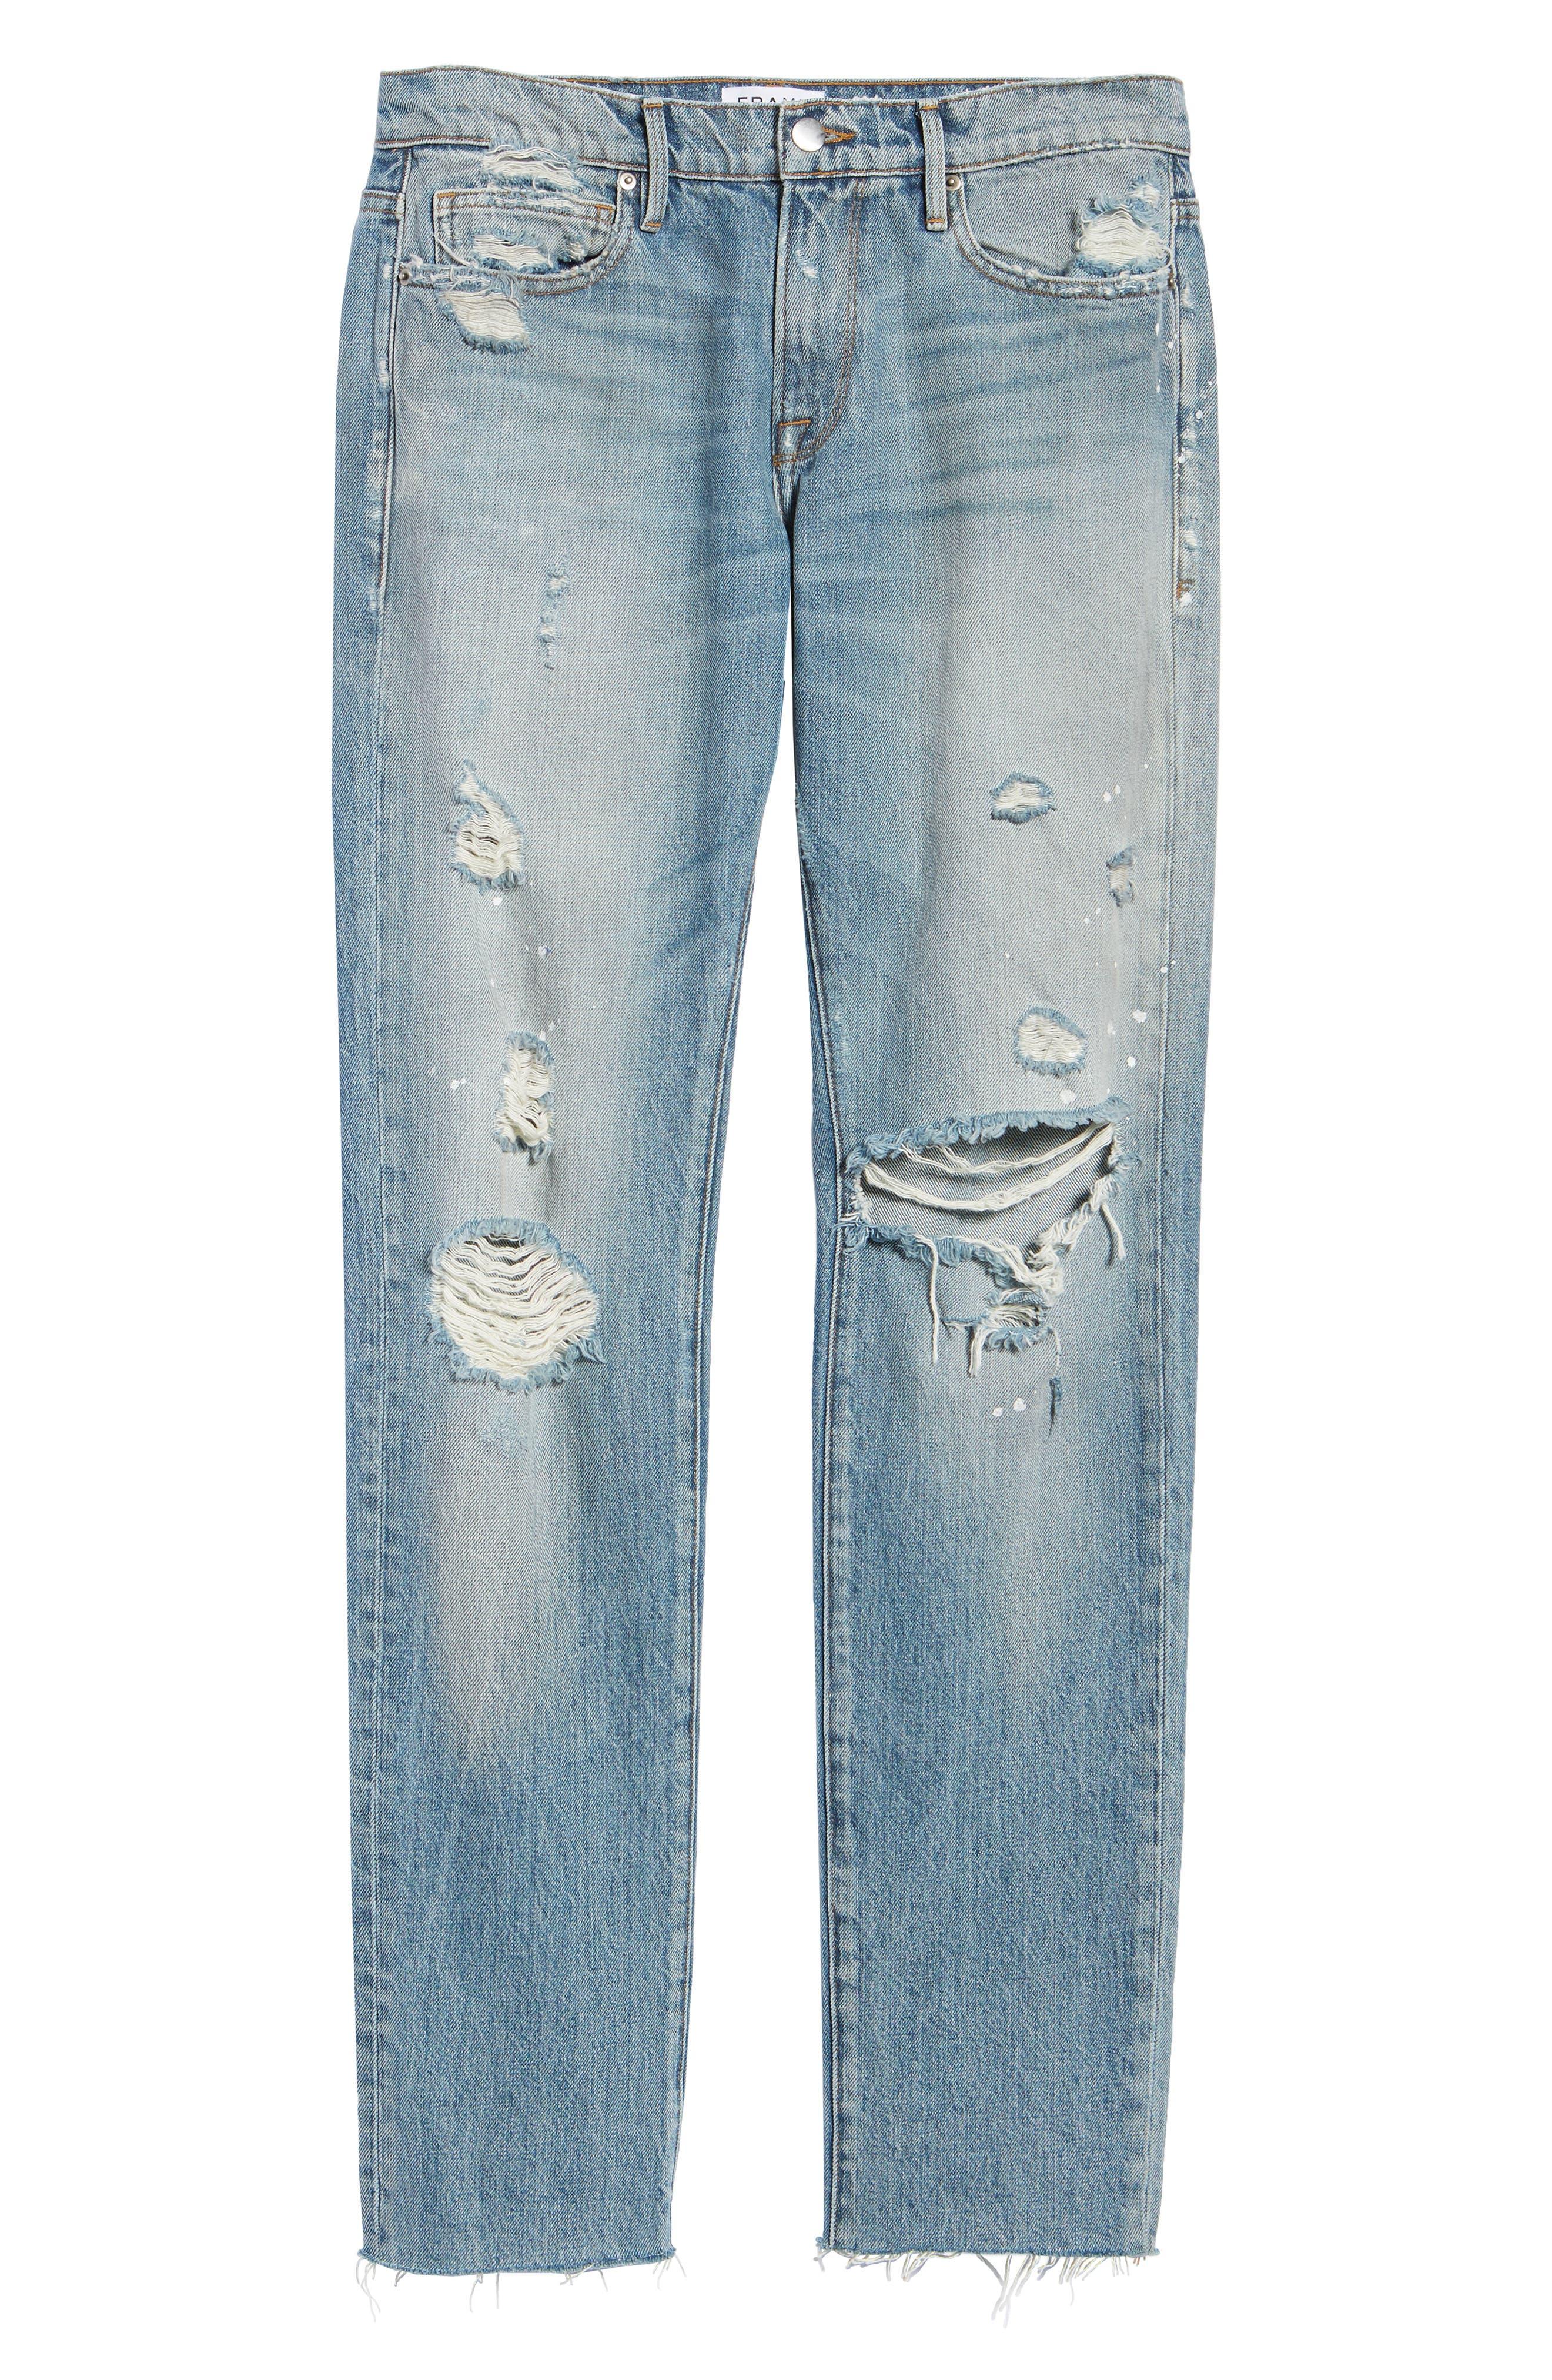 L'Homme Slim Fit Jeans,                             Alternate thumbnail 6, color,                             Bizworth